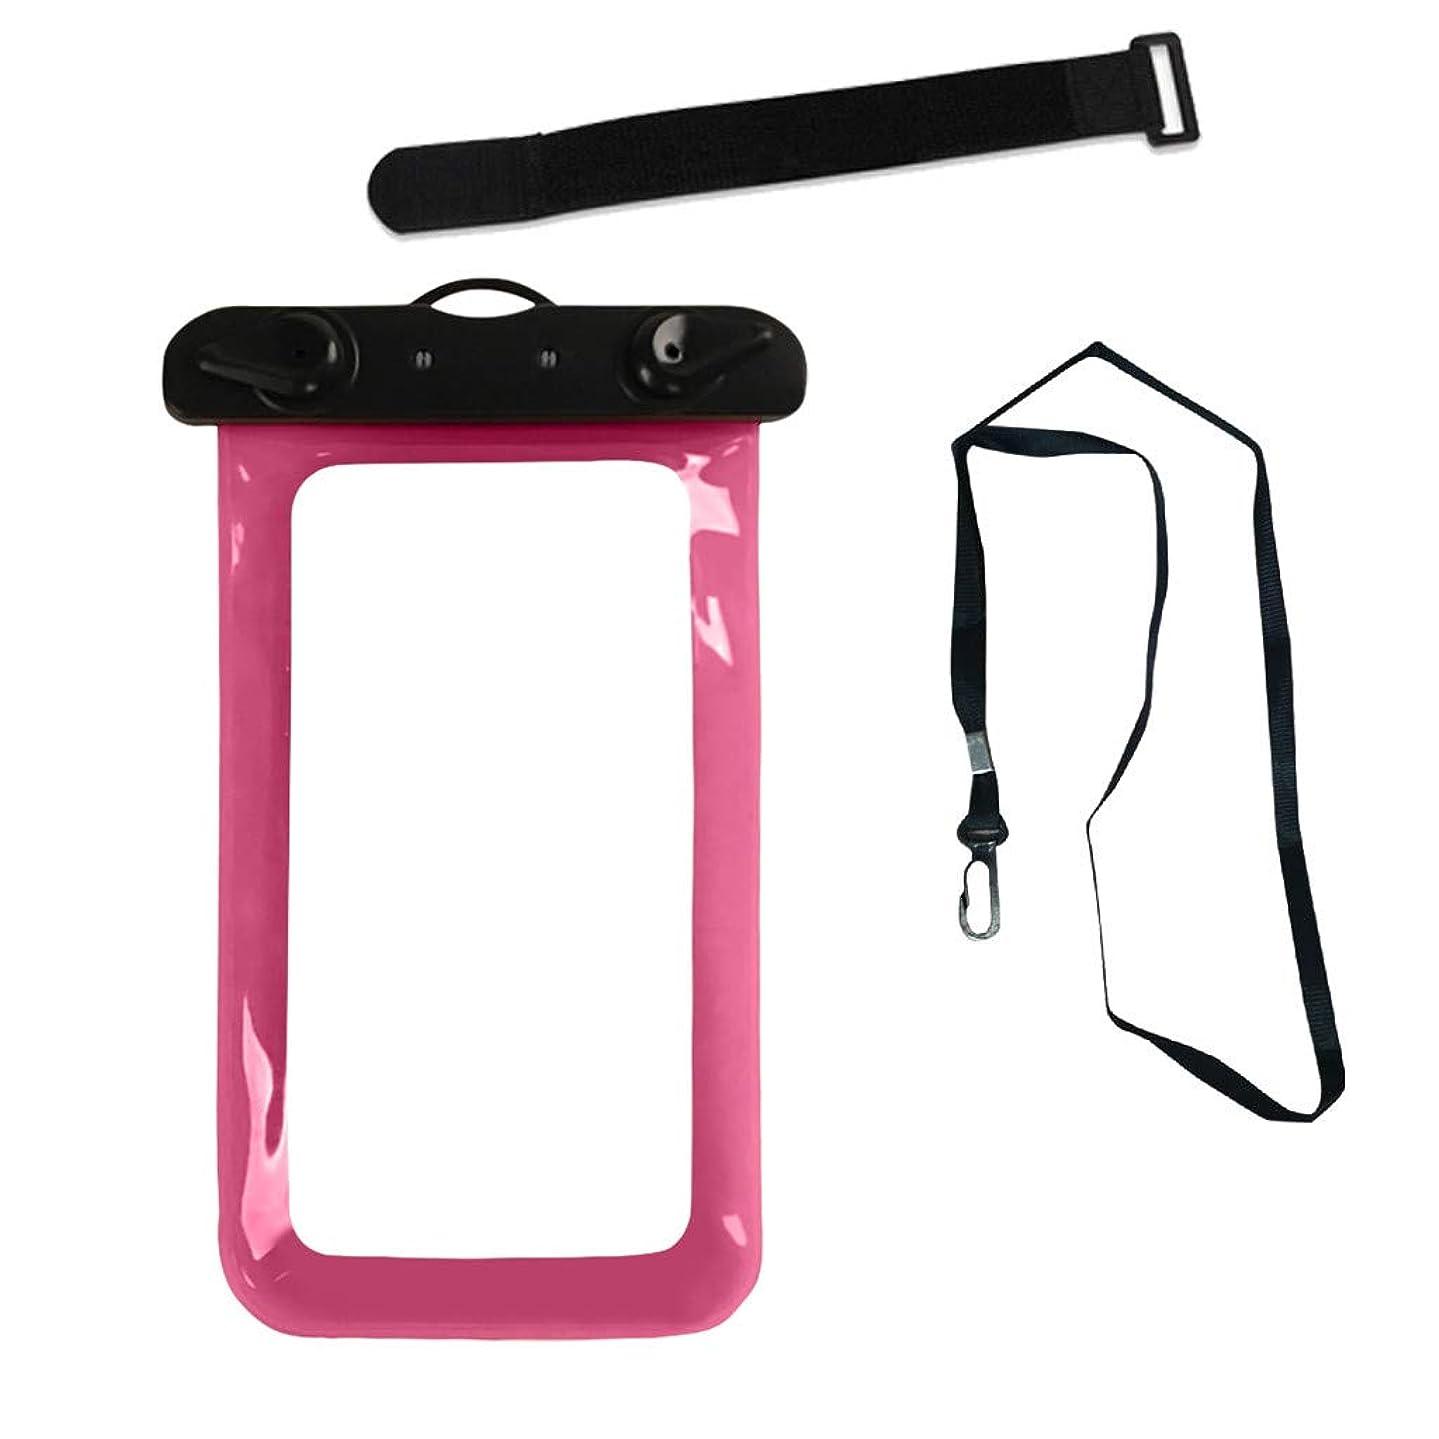 Alisy Waterproof Phone Case, Waterproof Bag Cellphone Mobile Pouch Dry Bag Underwater Case for Pools Beach Kayaking Travel or Bath (Pink)